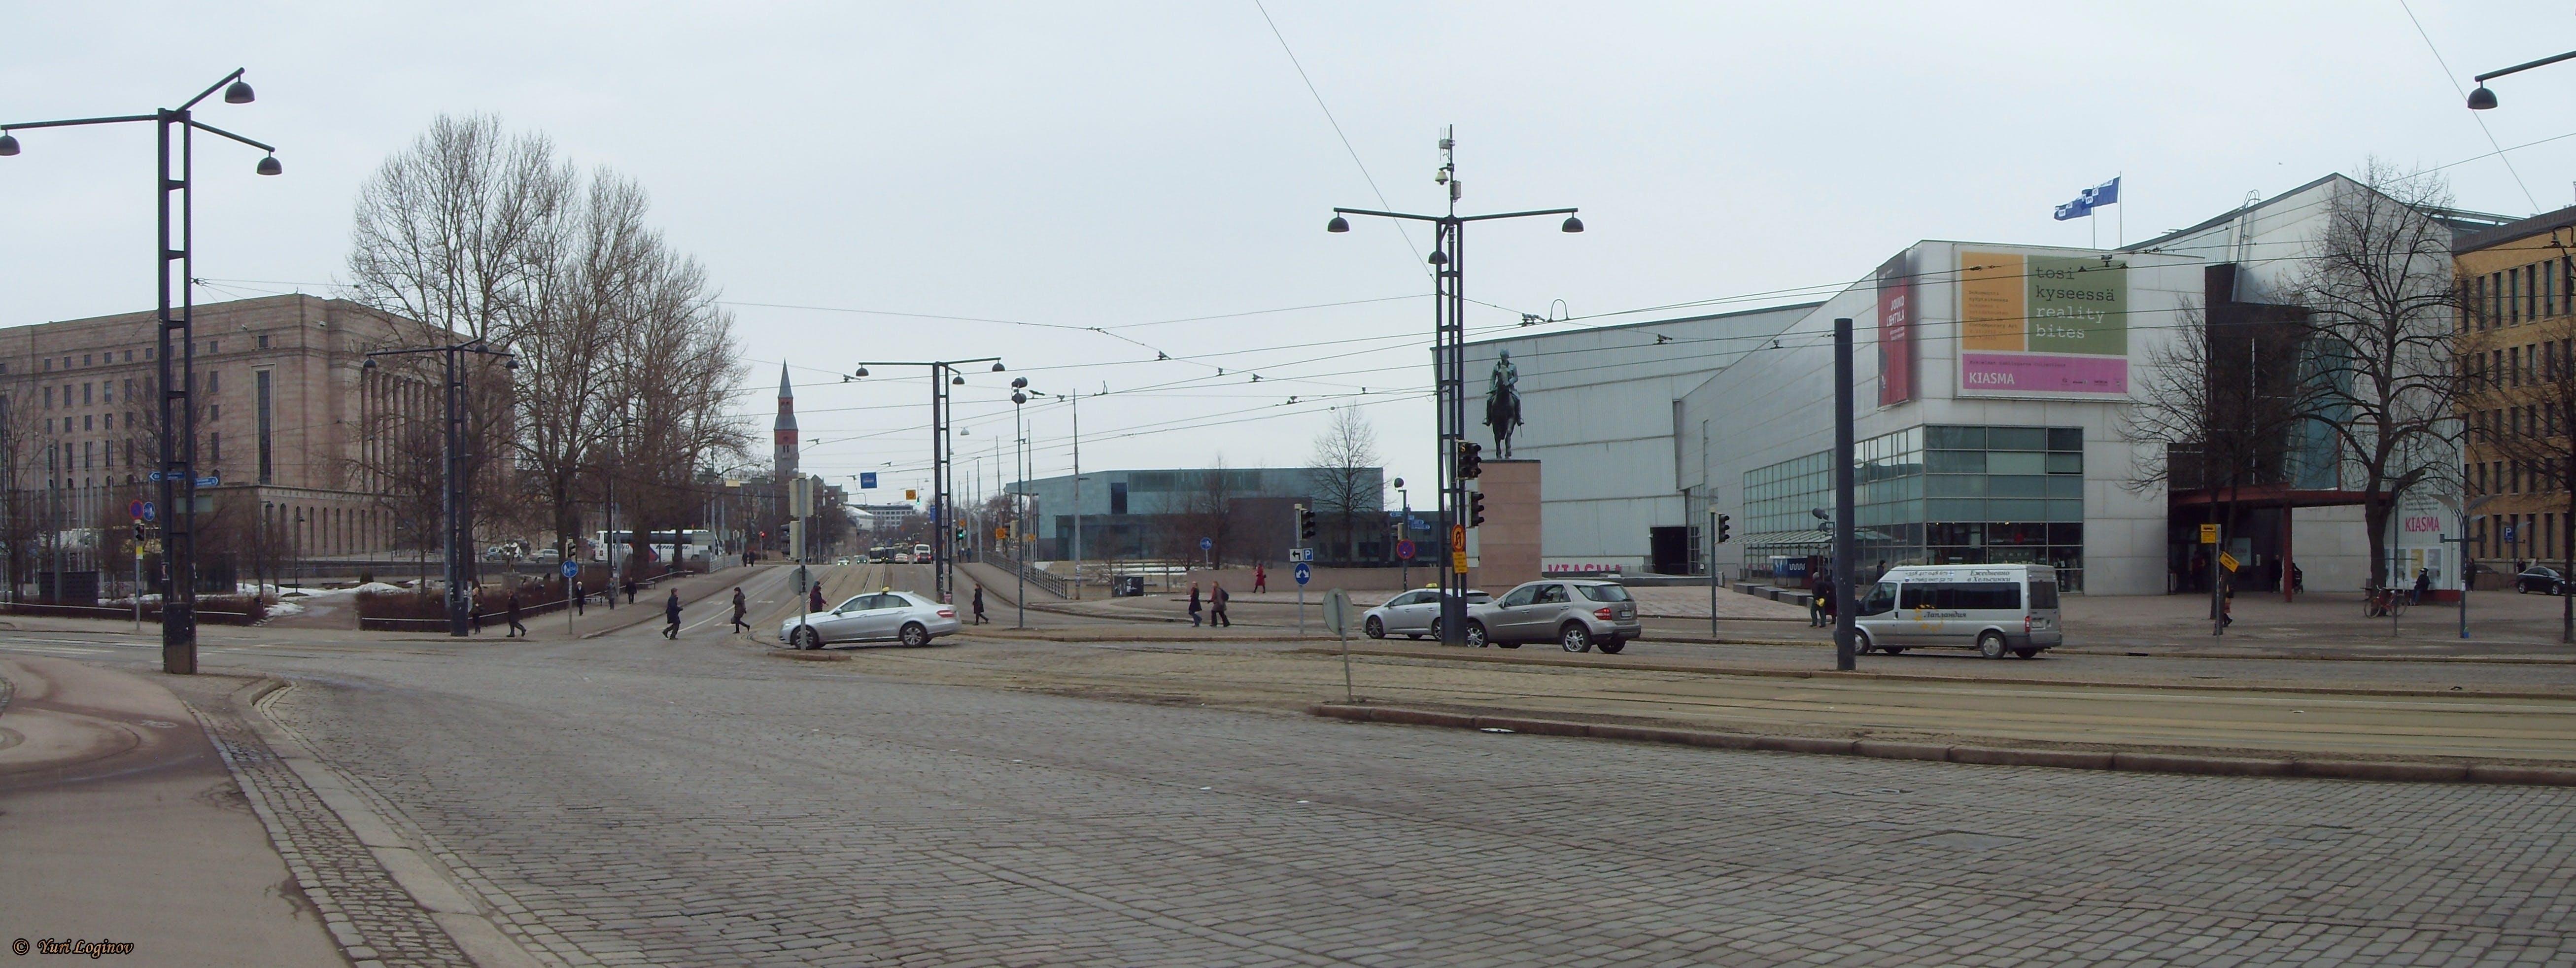 Free stock photo of Finland, Helsinki, Suomi, Mannerheimintie